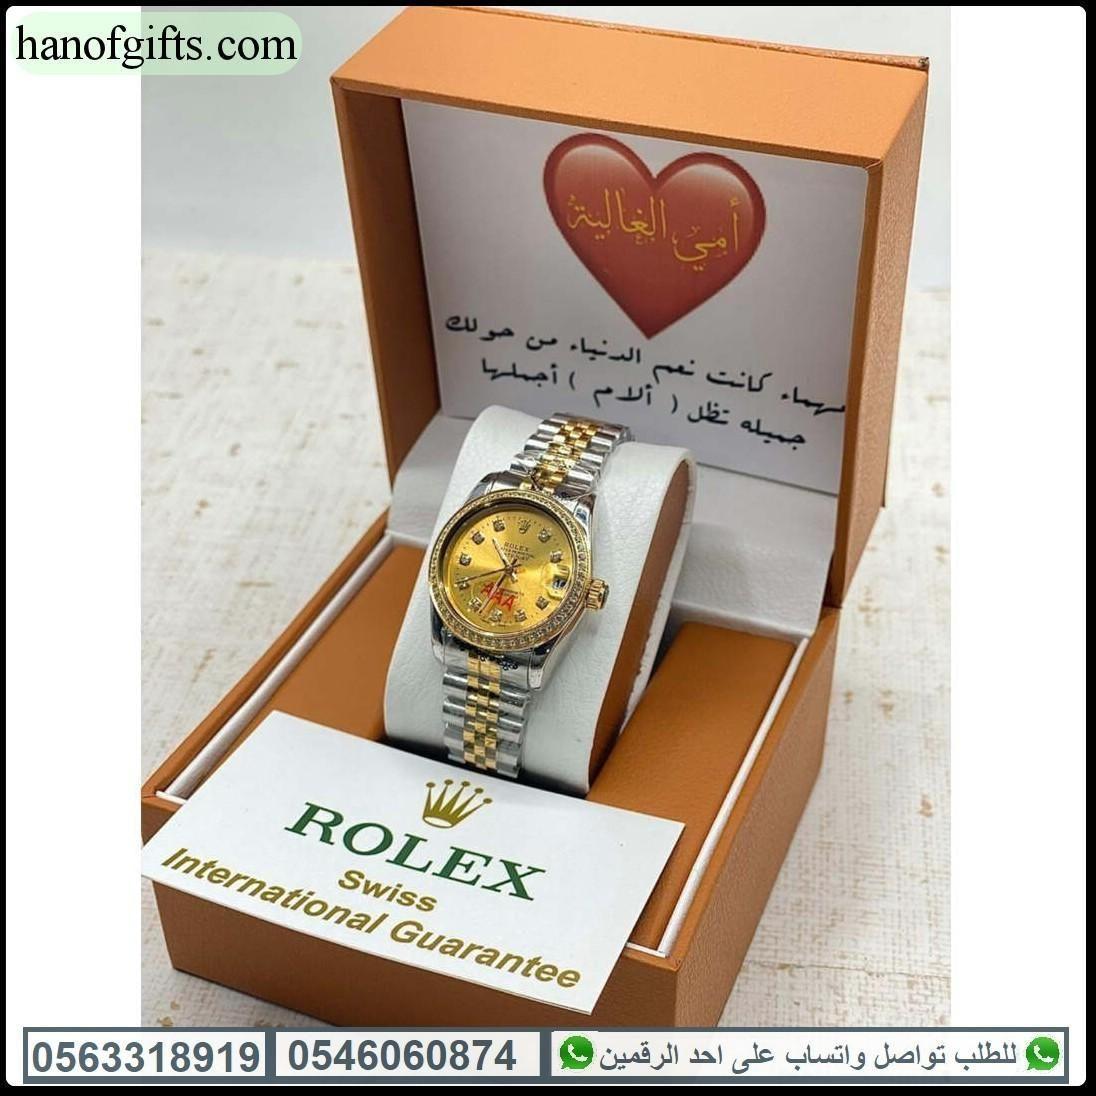 ساعات نسائي رولكس هدية امي الغالية علبه فخمه وكرت رولكس هدايا هنوف Rolex Tbl